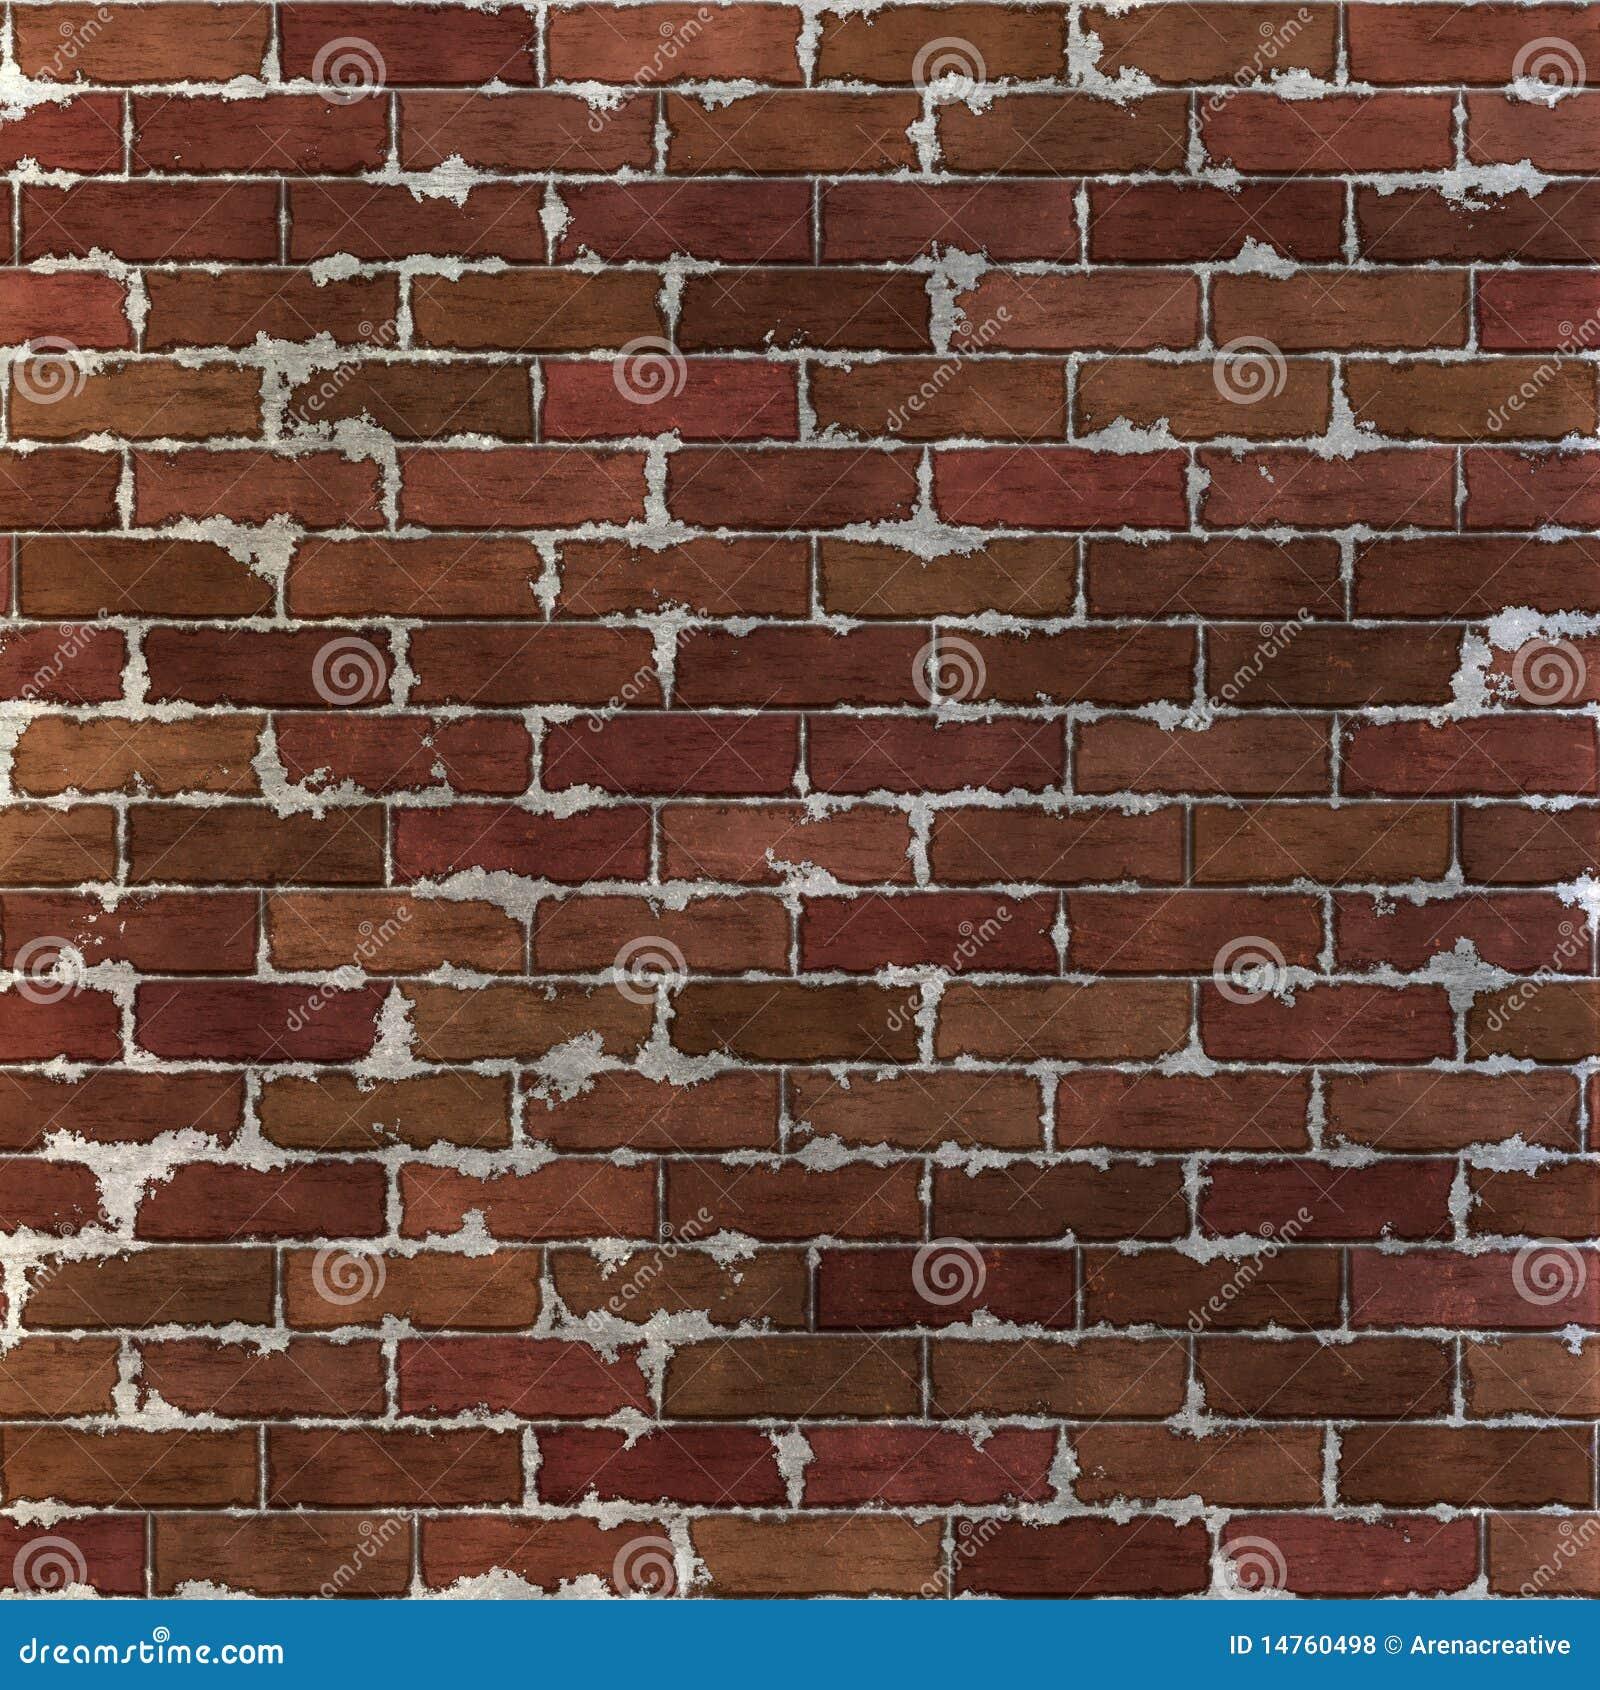 Seamless brick wall pattern royalty free stock photos - Brick wall patterns designs ...